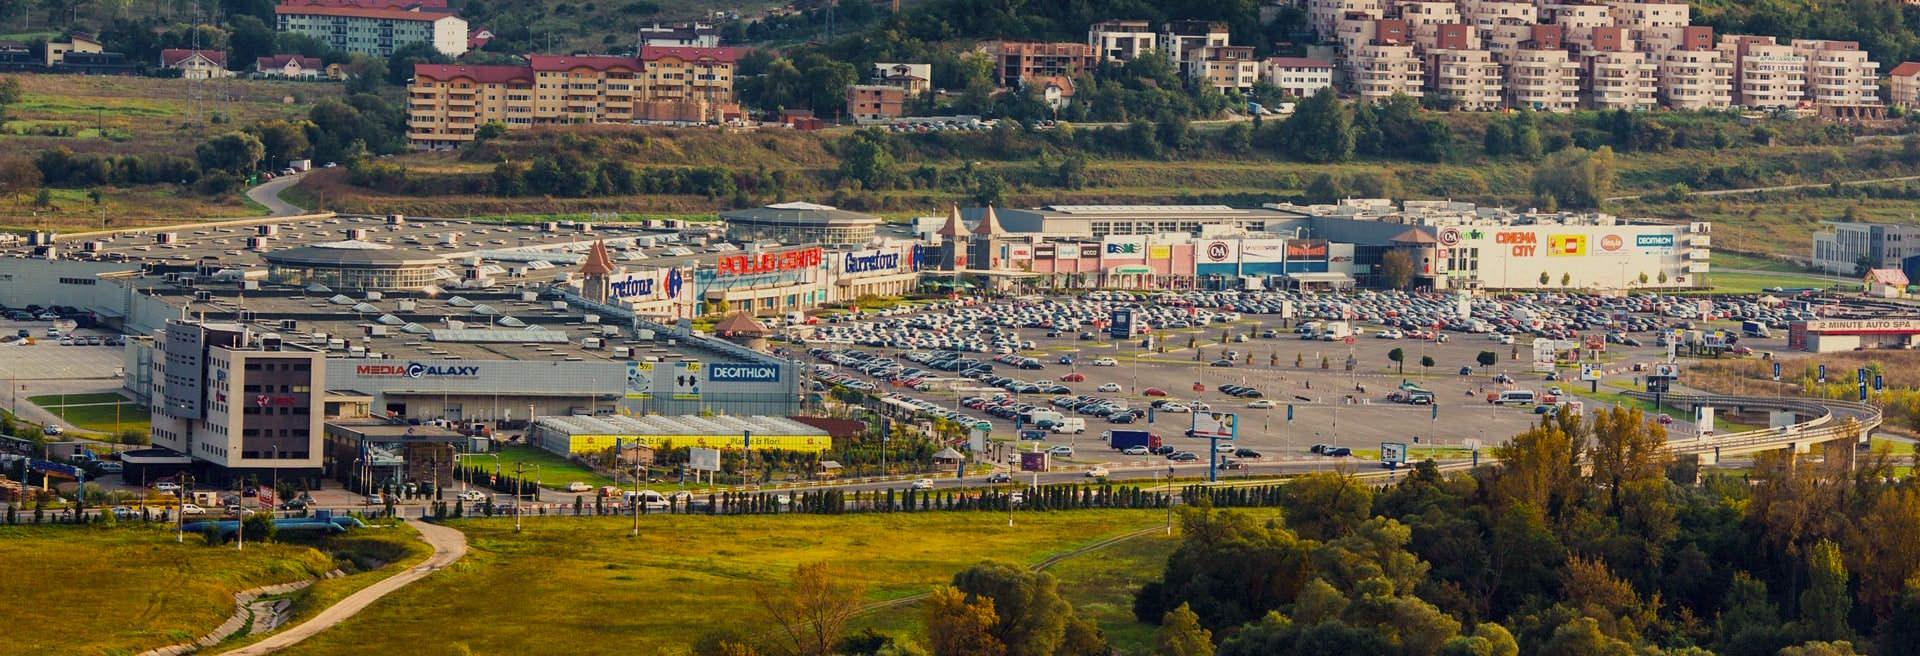 Polus Mall, Cluj